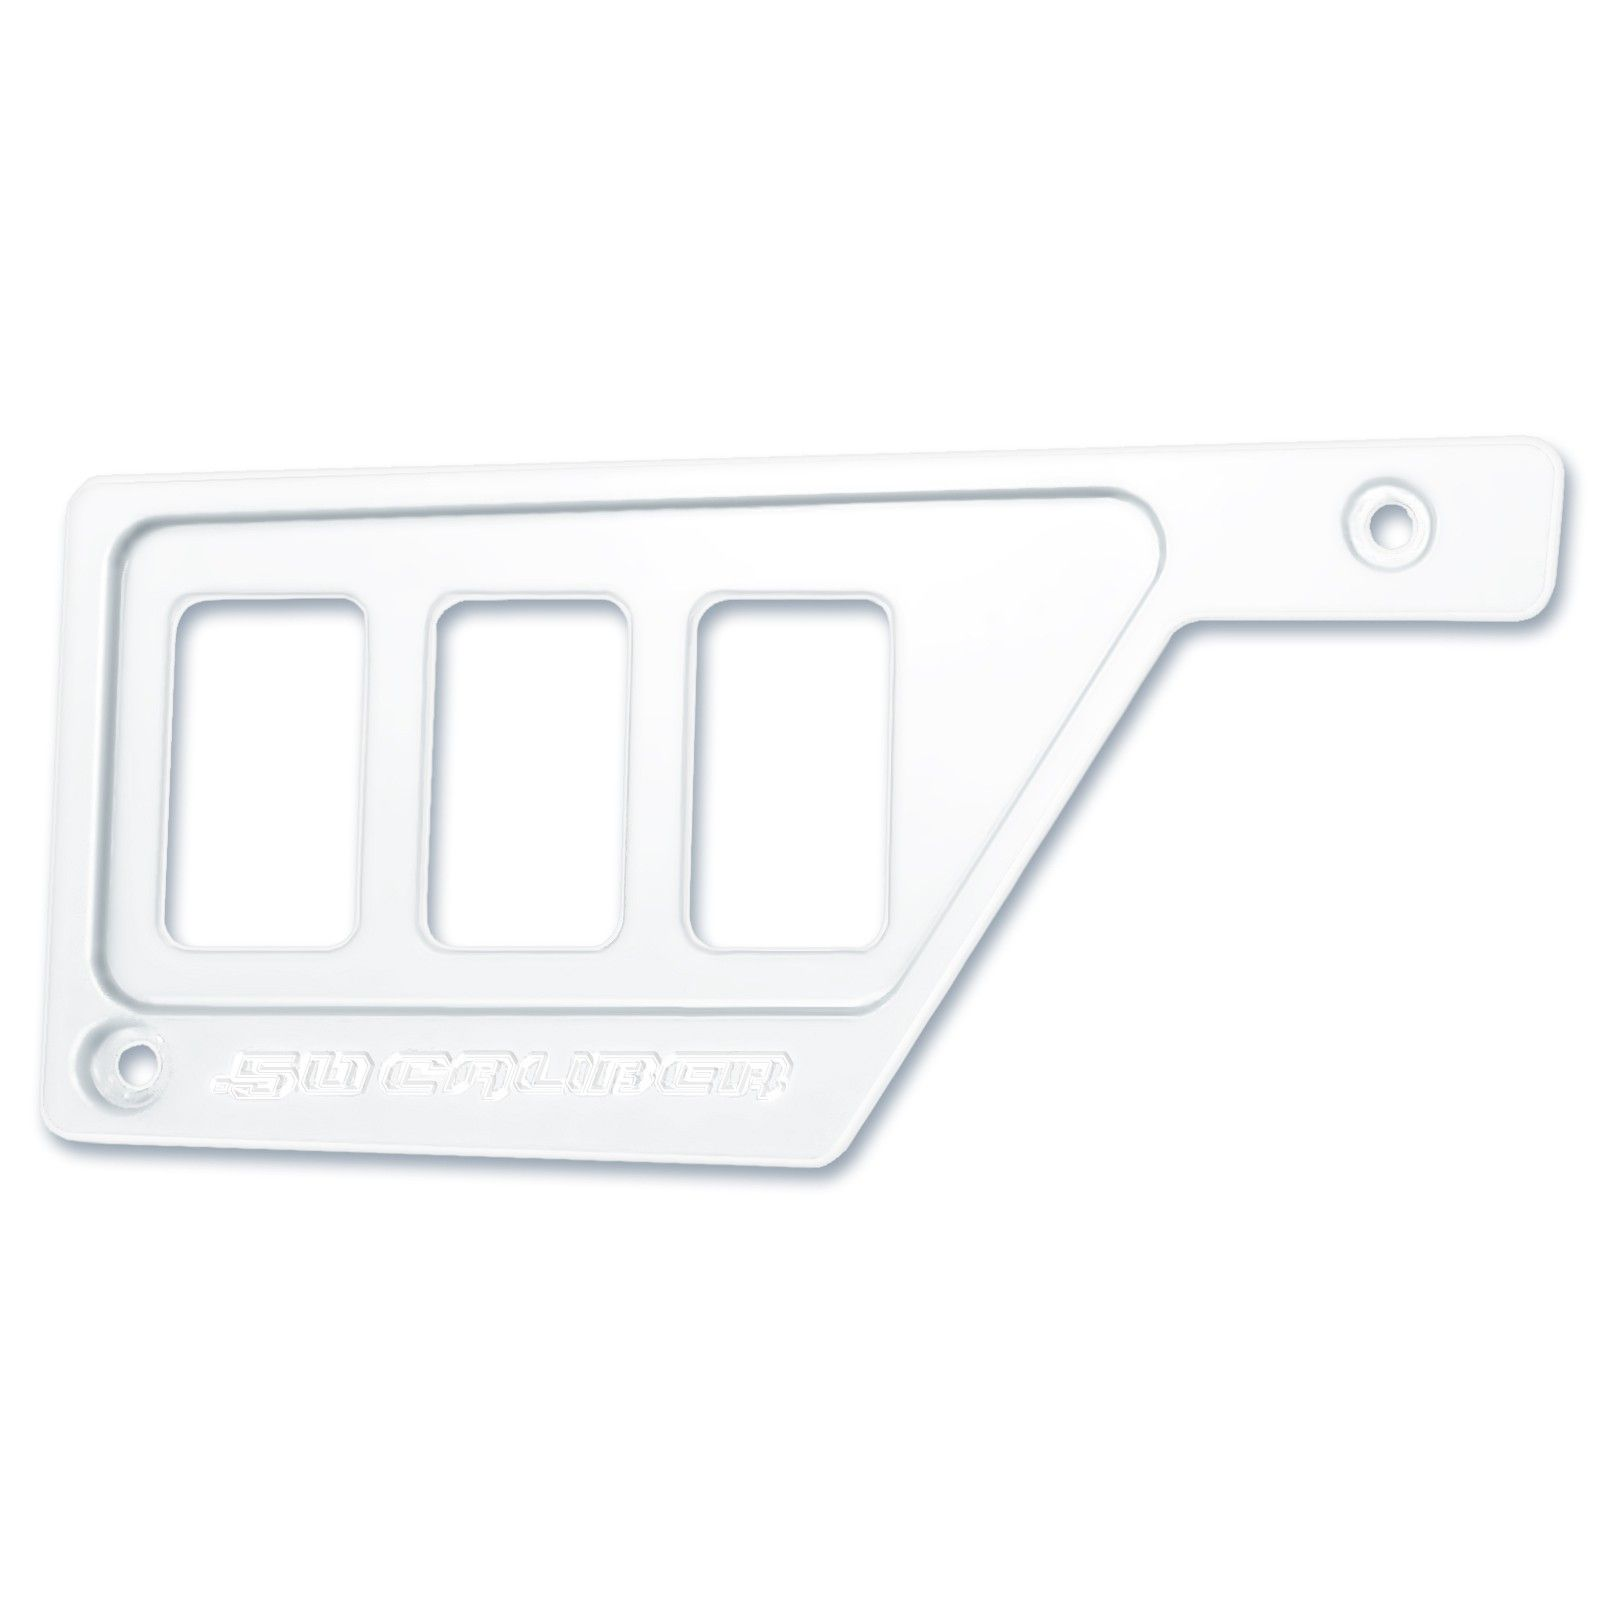 Polaris Xp Cnc Billet Aluminum Dash Panel With Powder